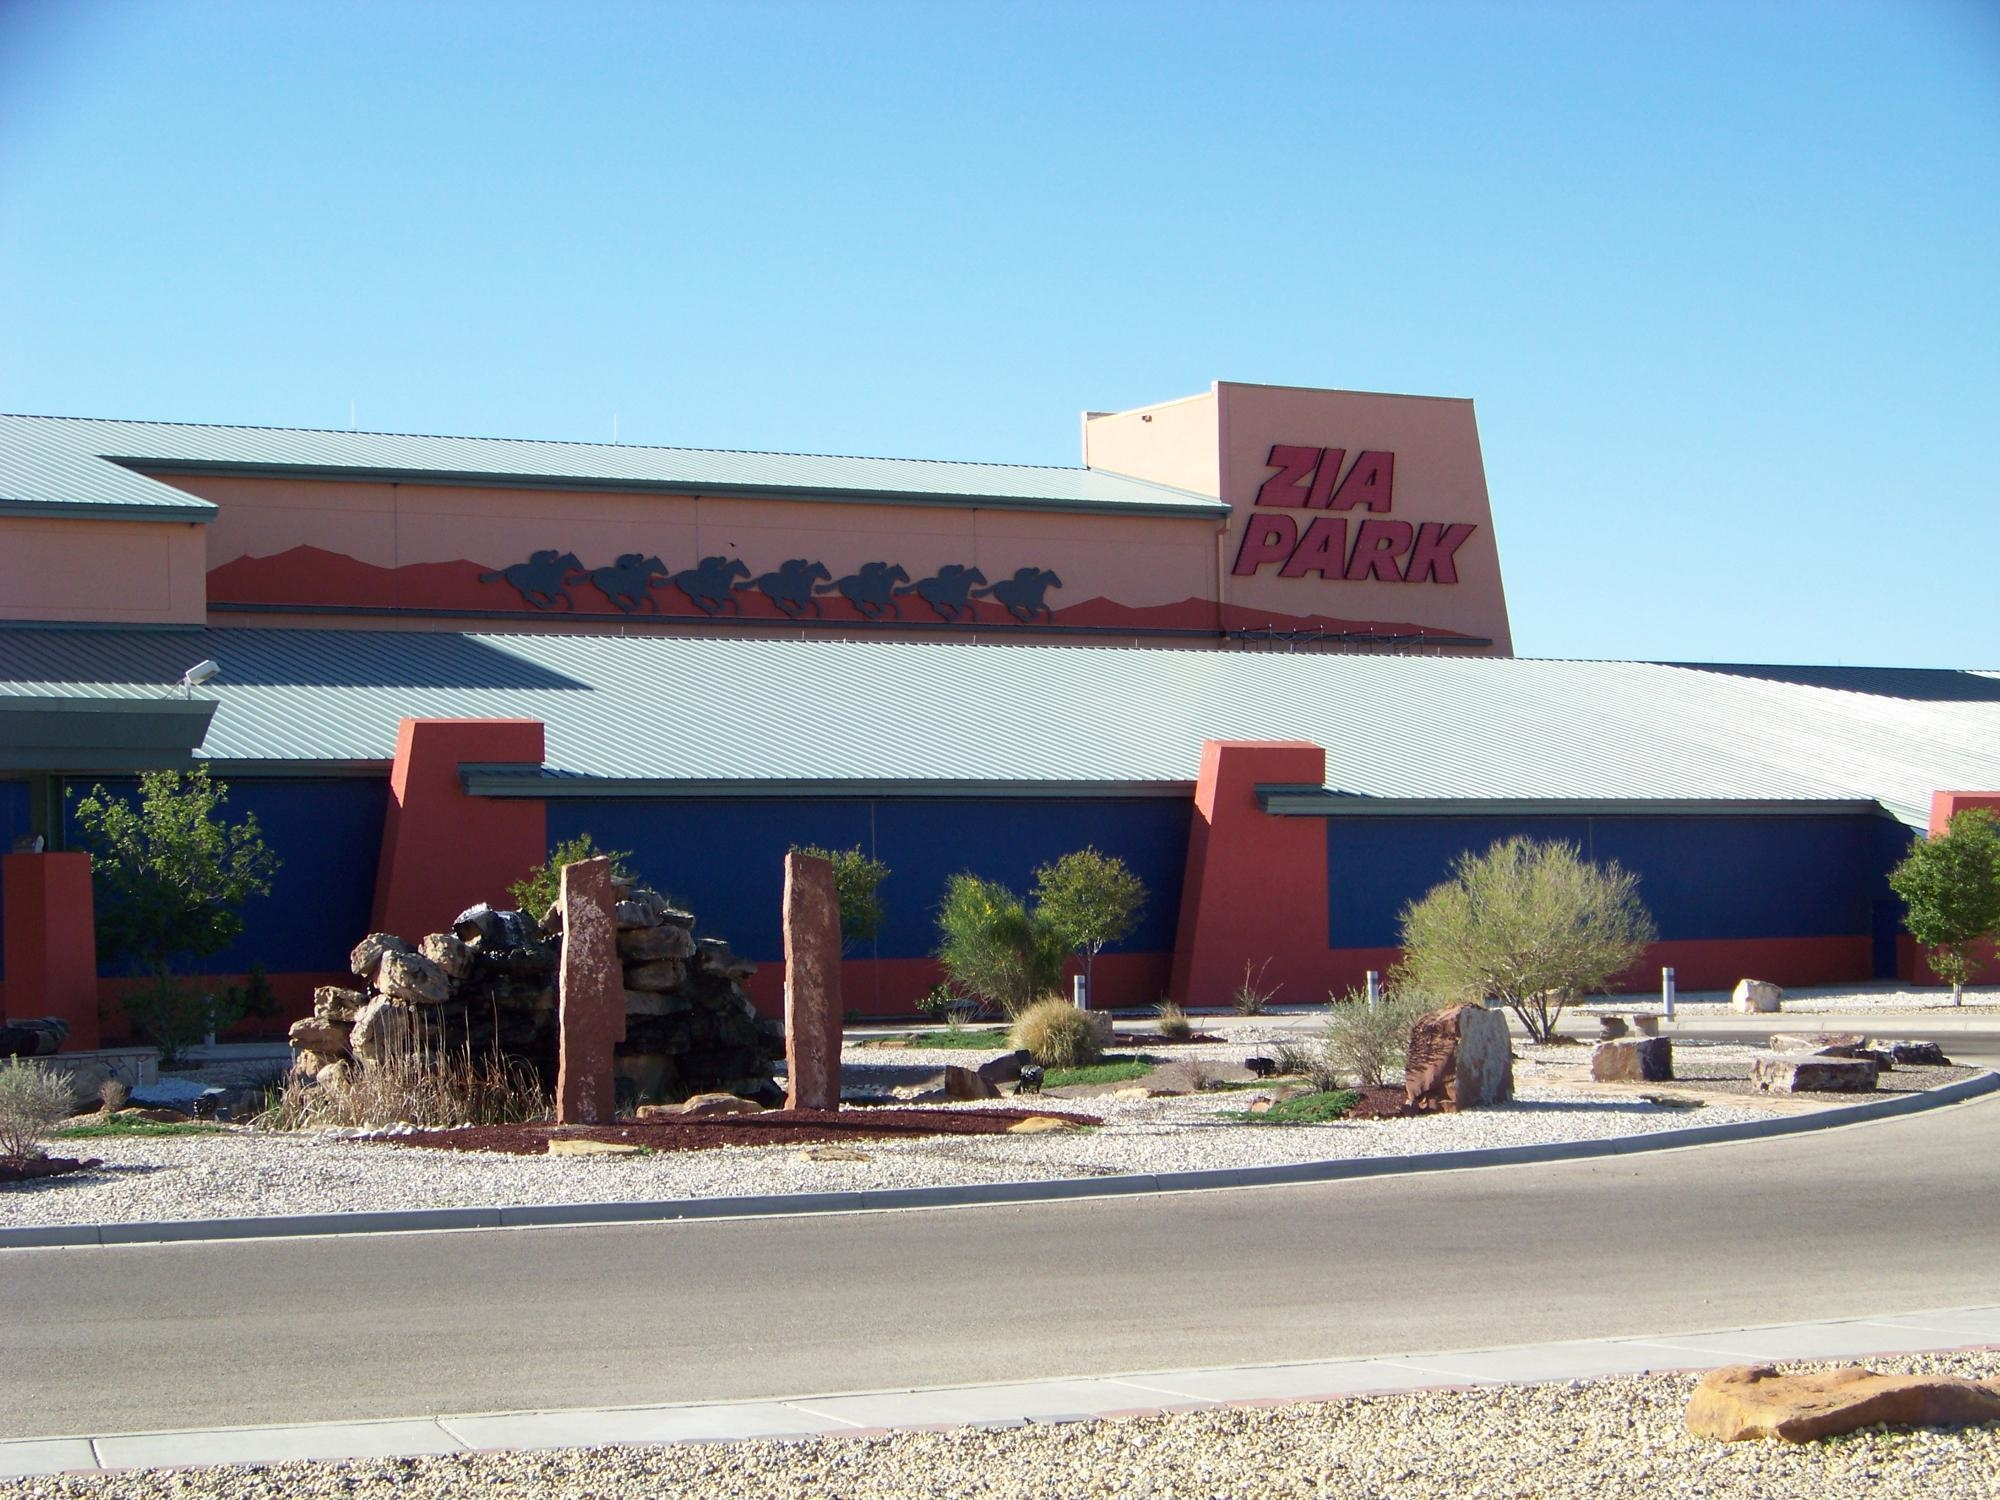 Zia casino hobbs new mexico